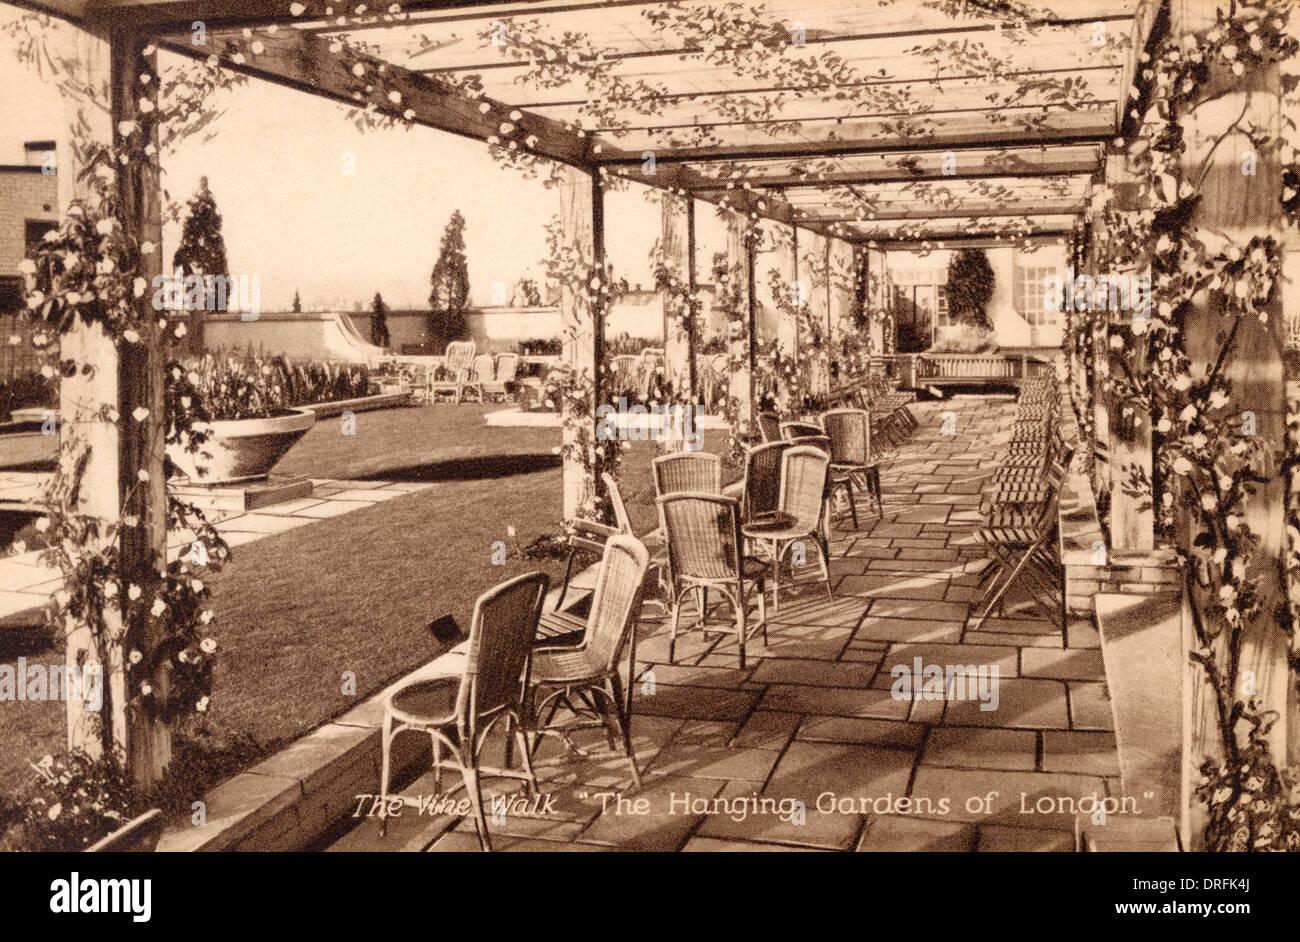 Selfridge's Hanging Gardens of London - Stock Image